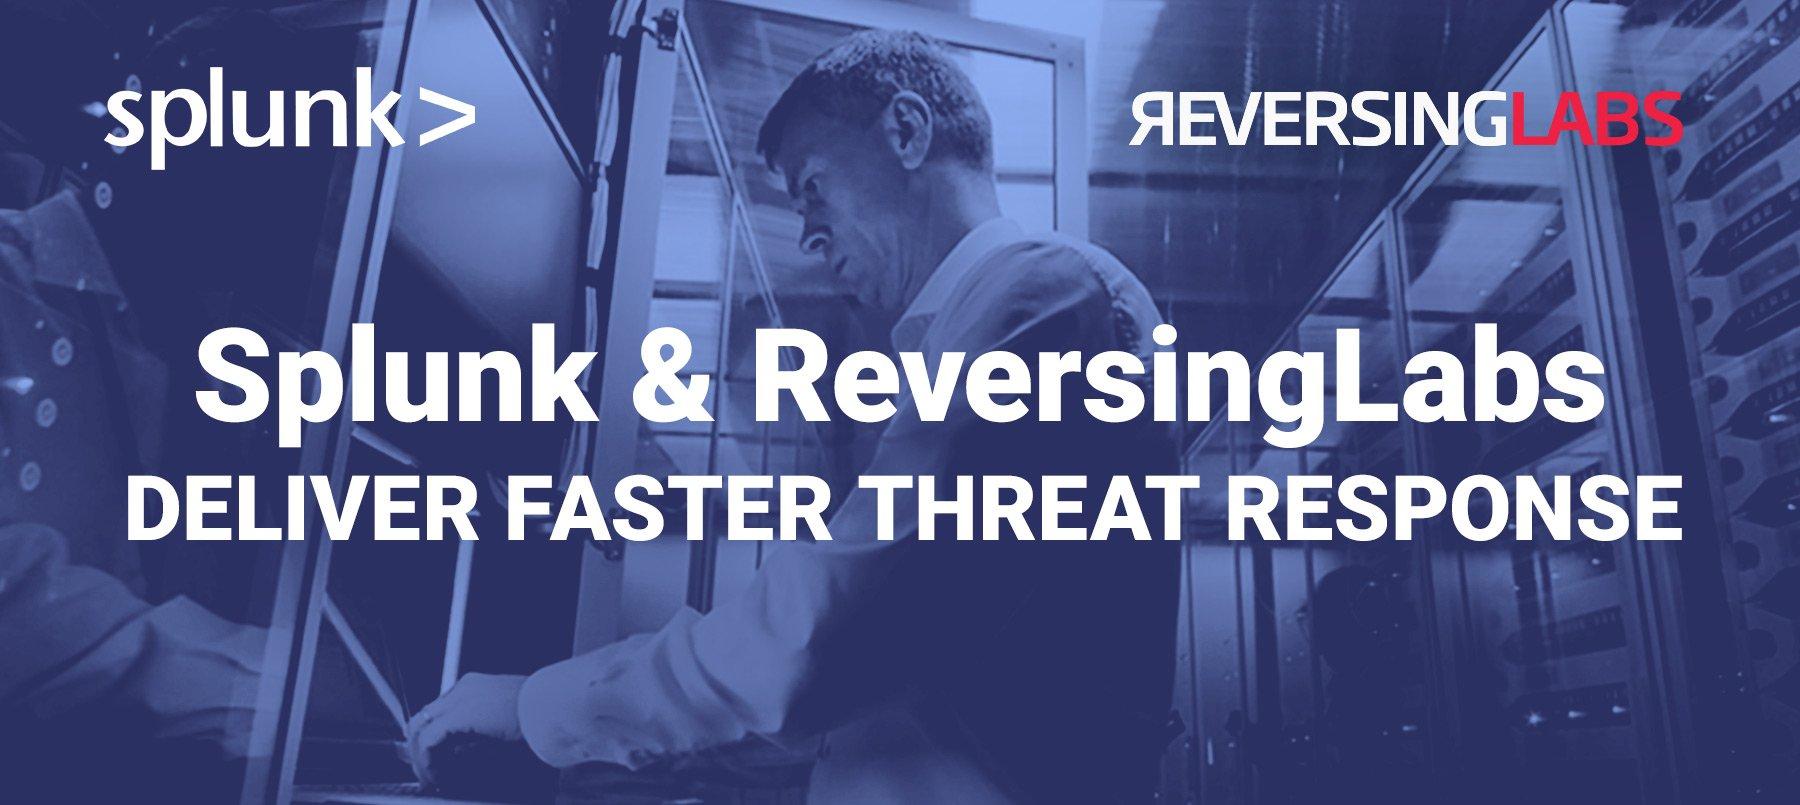 Splunk_Reversing_Labs_Webinar